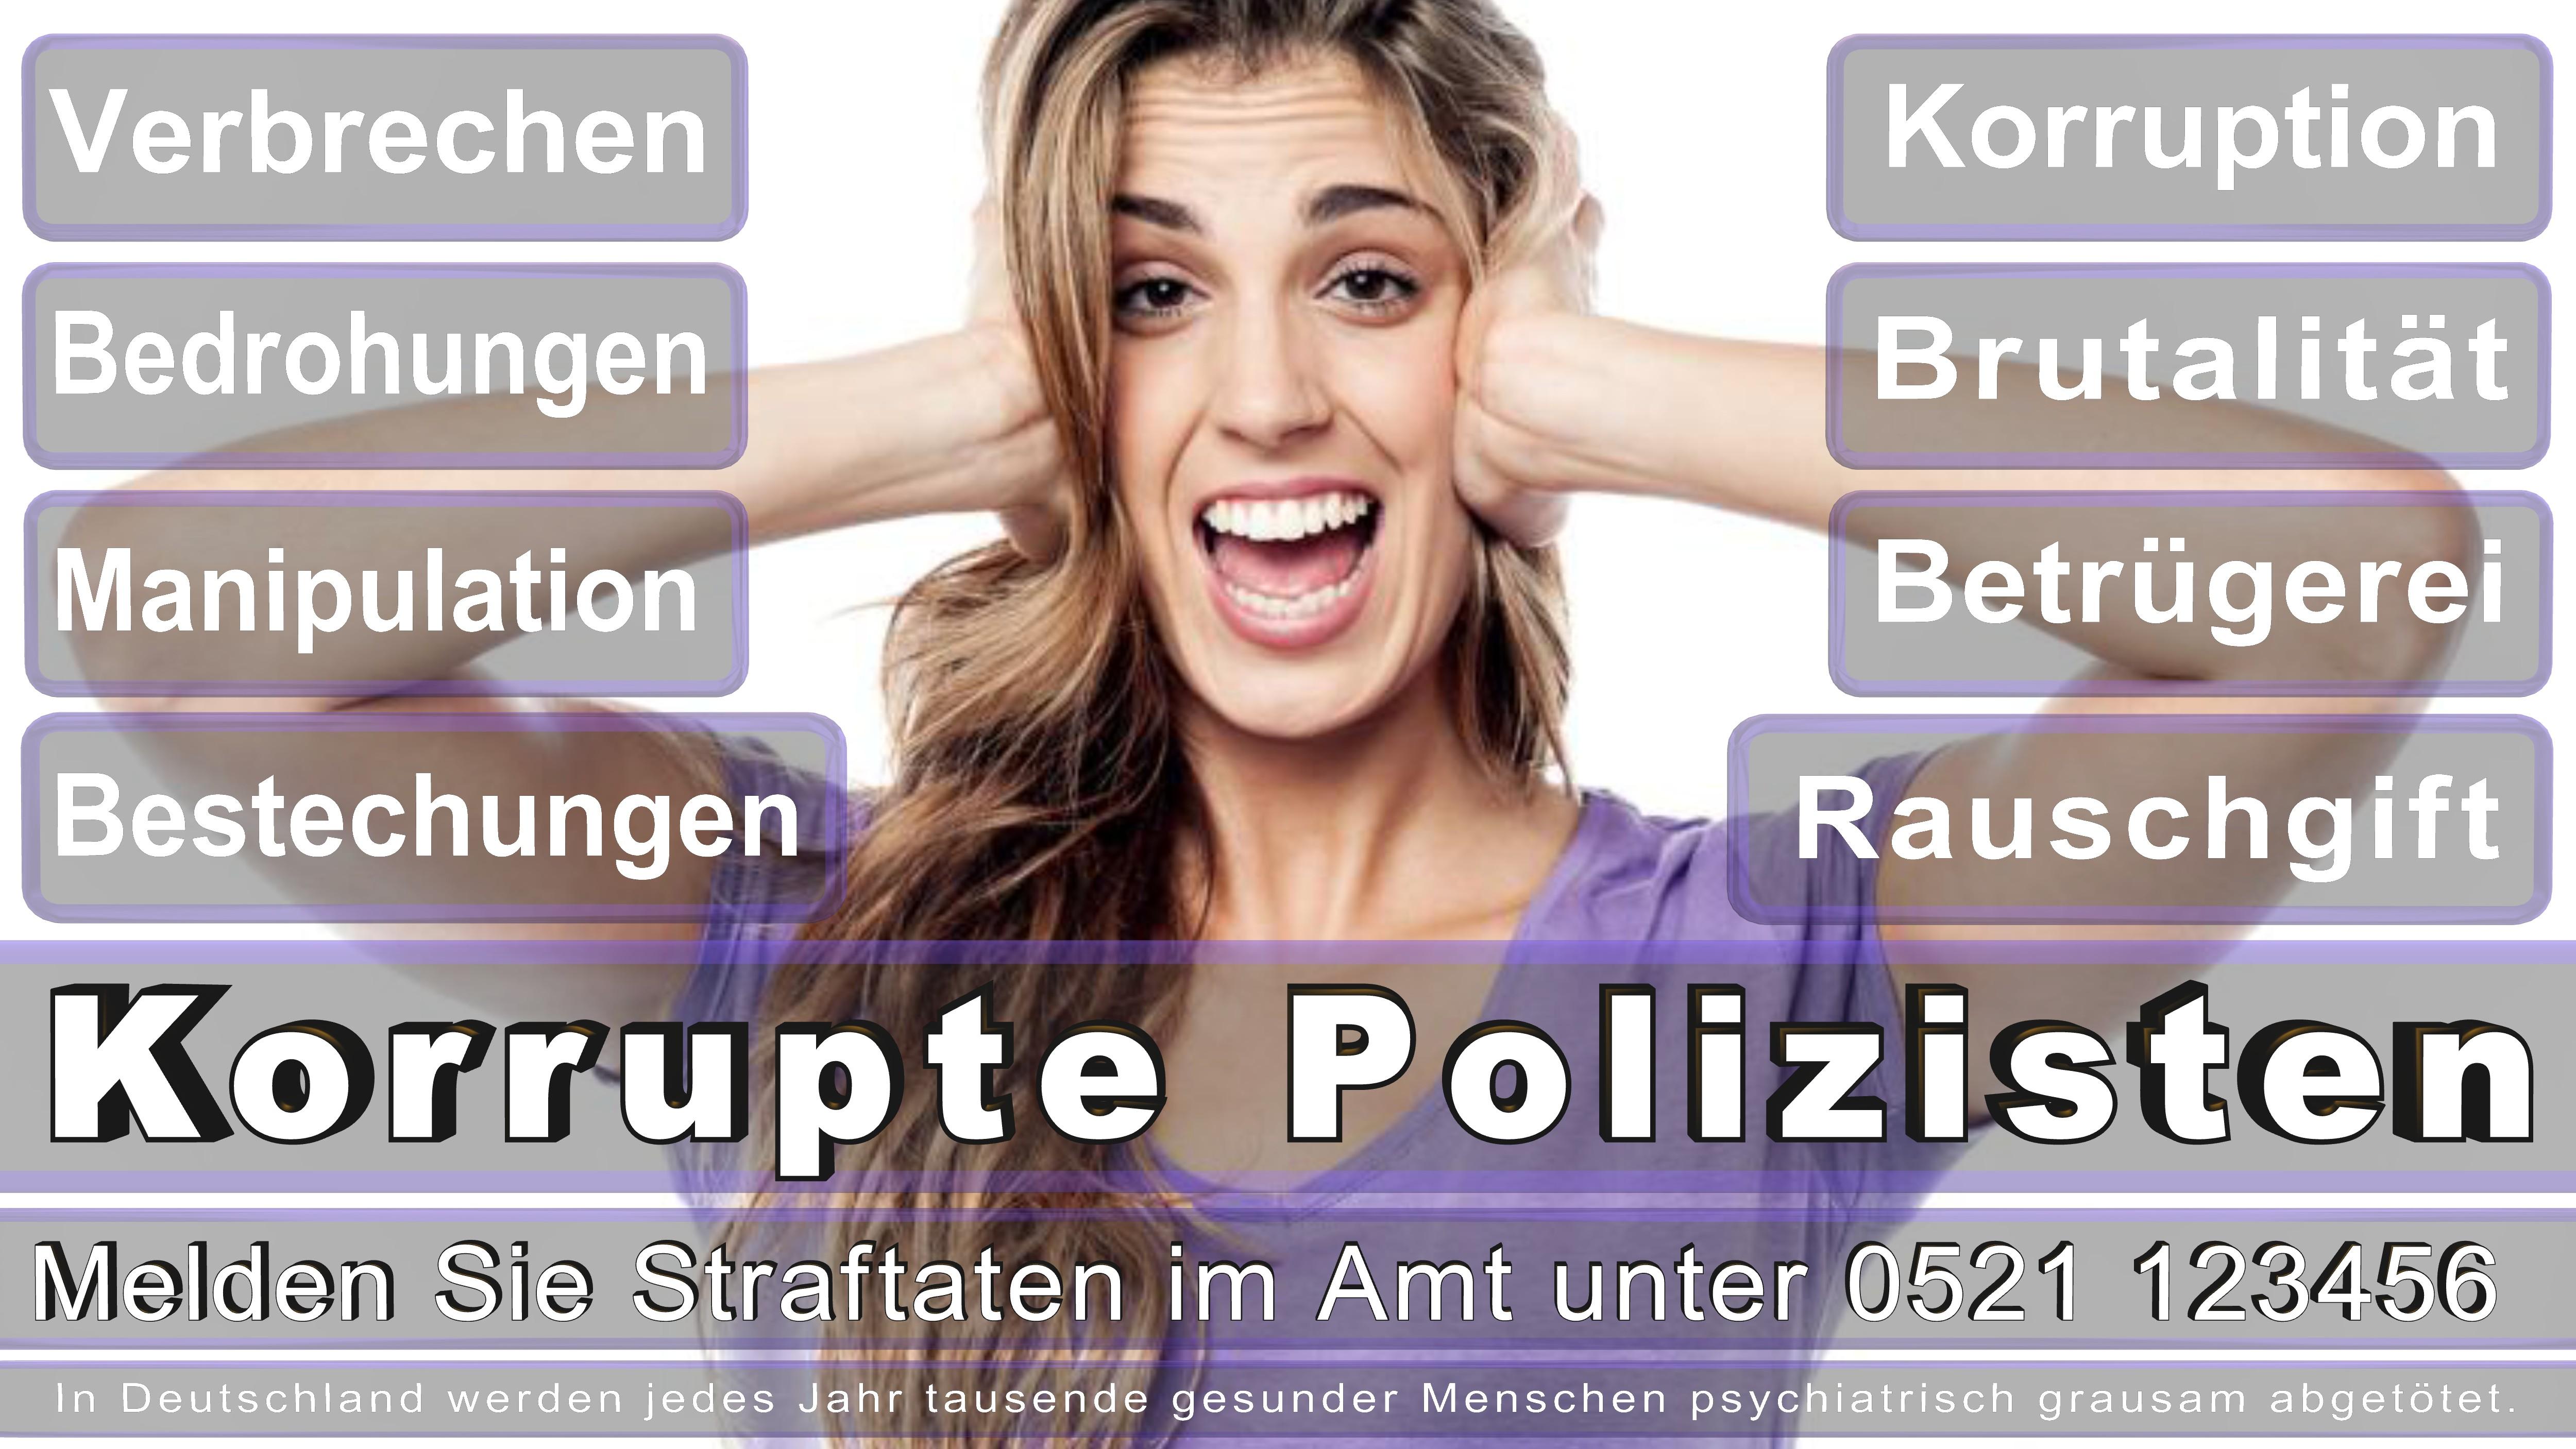 Polizei-Bielefeld-Polizei-Bielefeld-Polizei-Bielefeld (186)